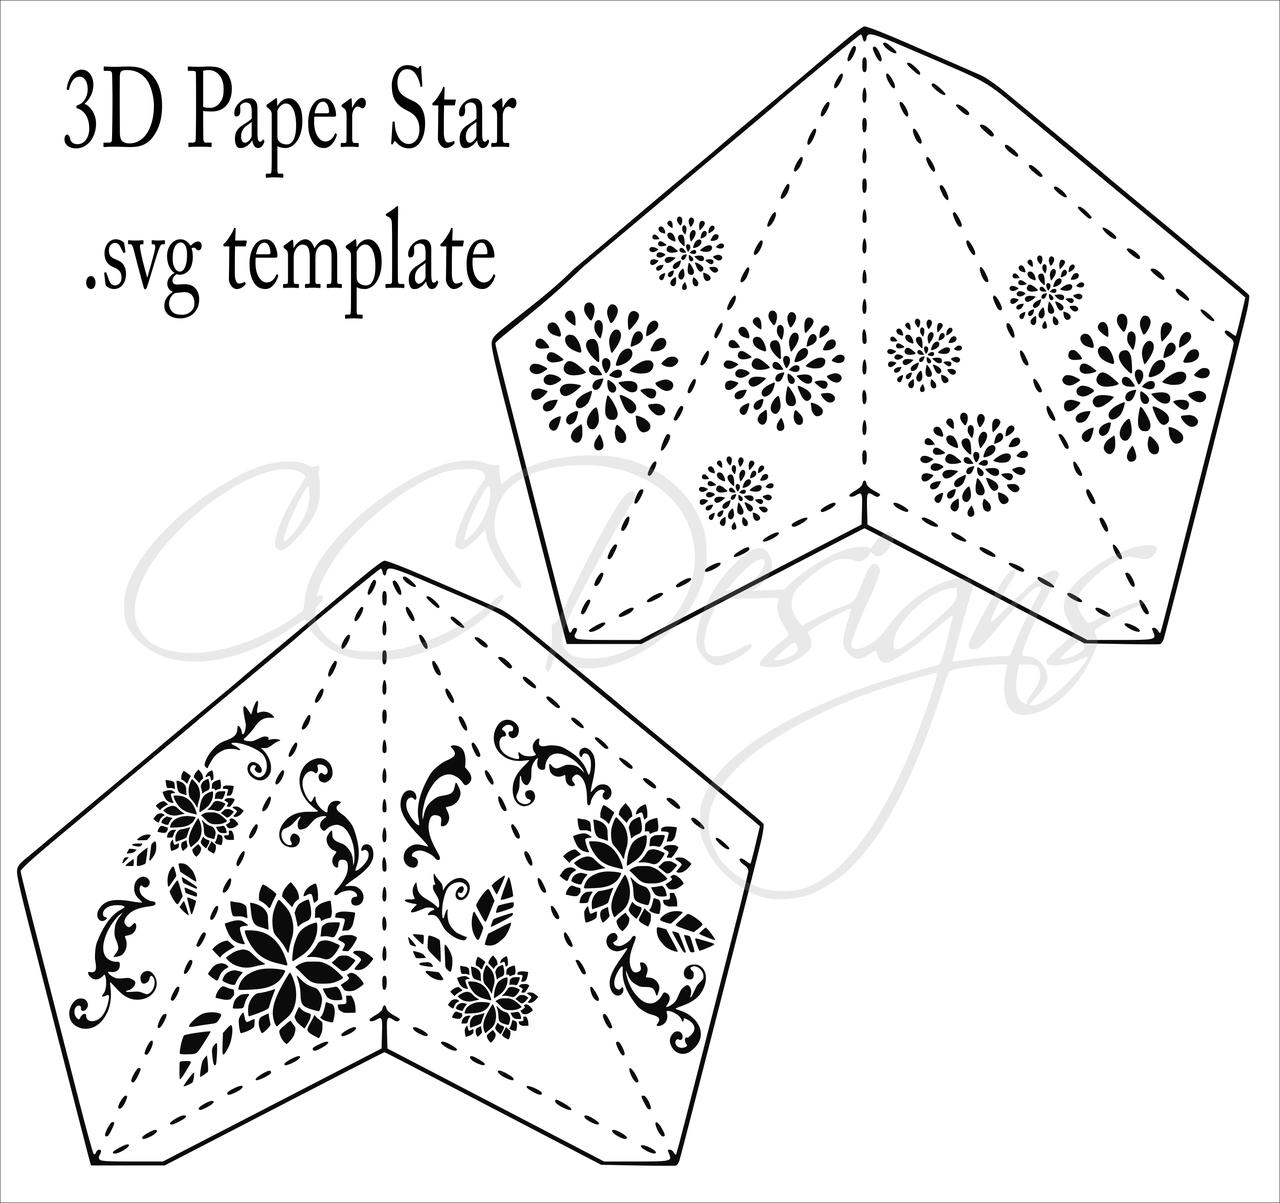 3d Paper Star Templates Diy Paper Star Craft Svg Pdf Template Catching Colorflies